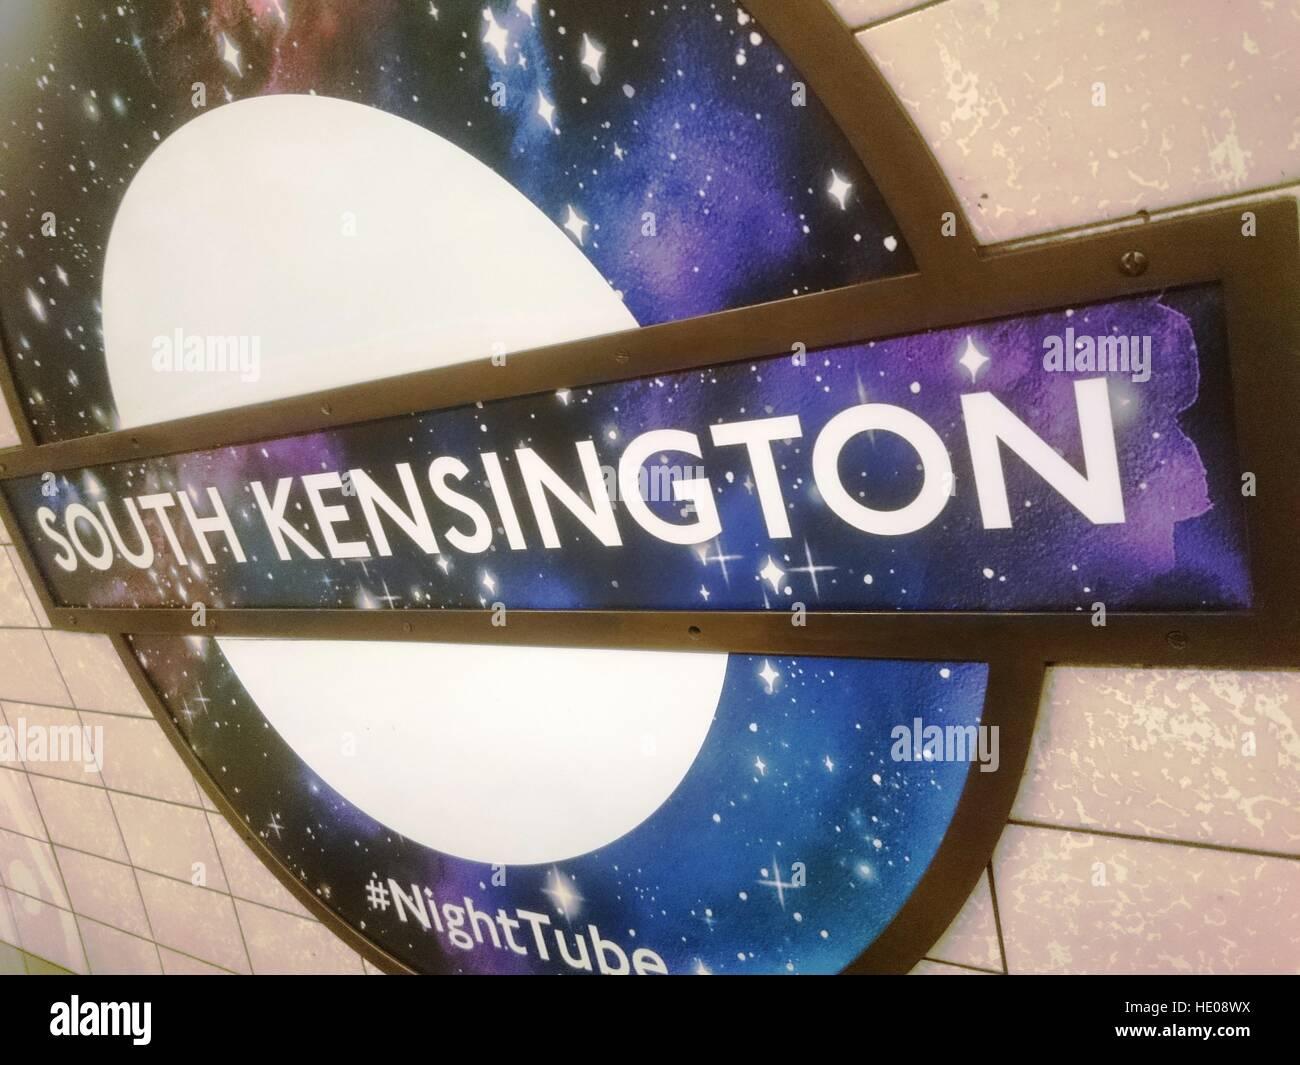 London, UK. 16th Dec, 2016. Night tube service starts to operate on Piccadilly line, London, UK © Nastia M/Alamy - Stock Image